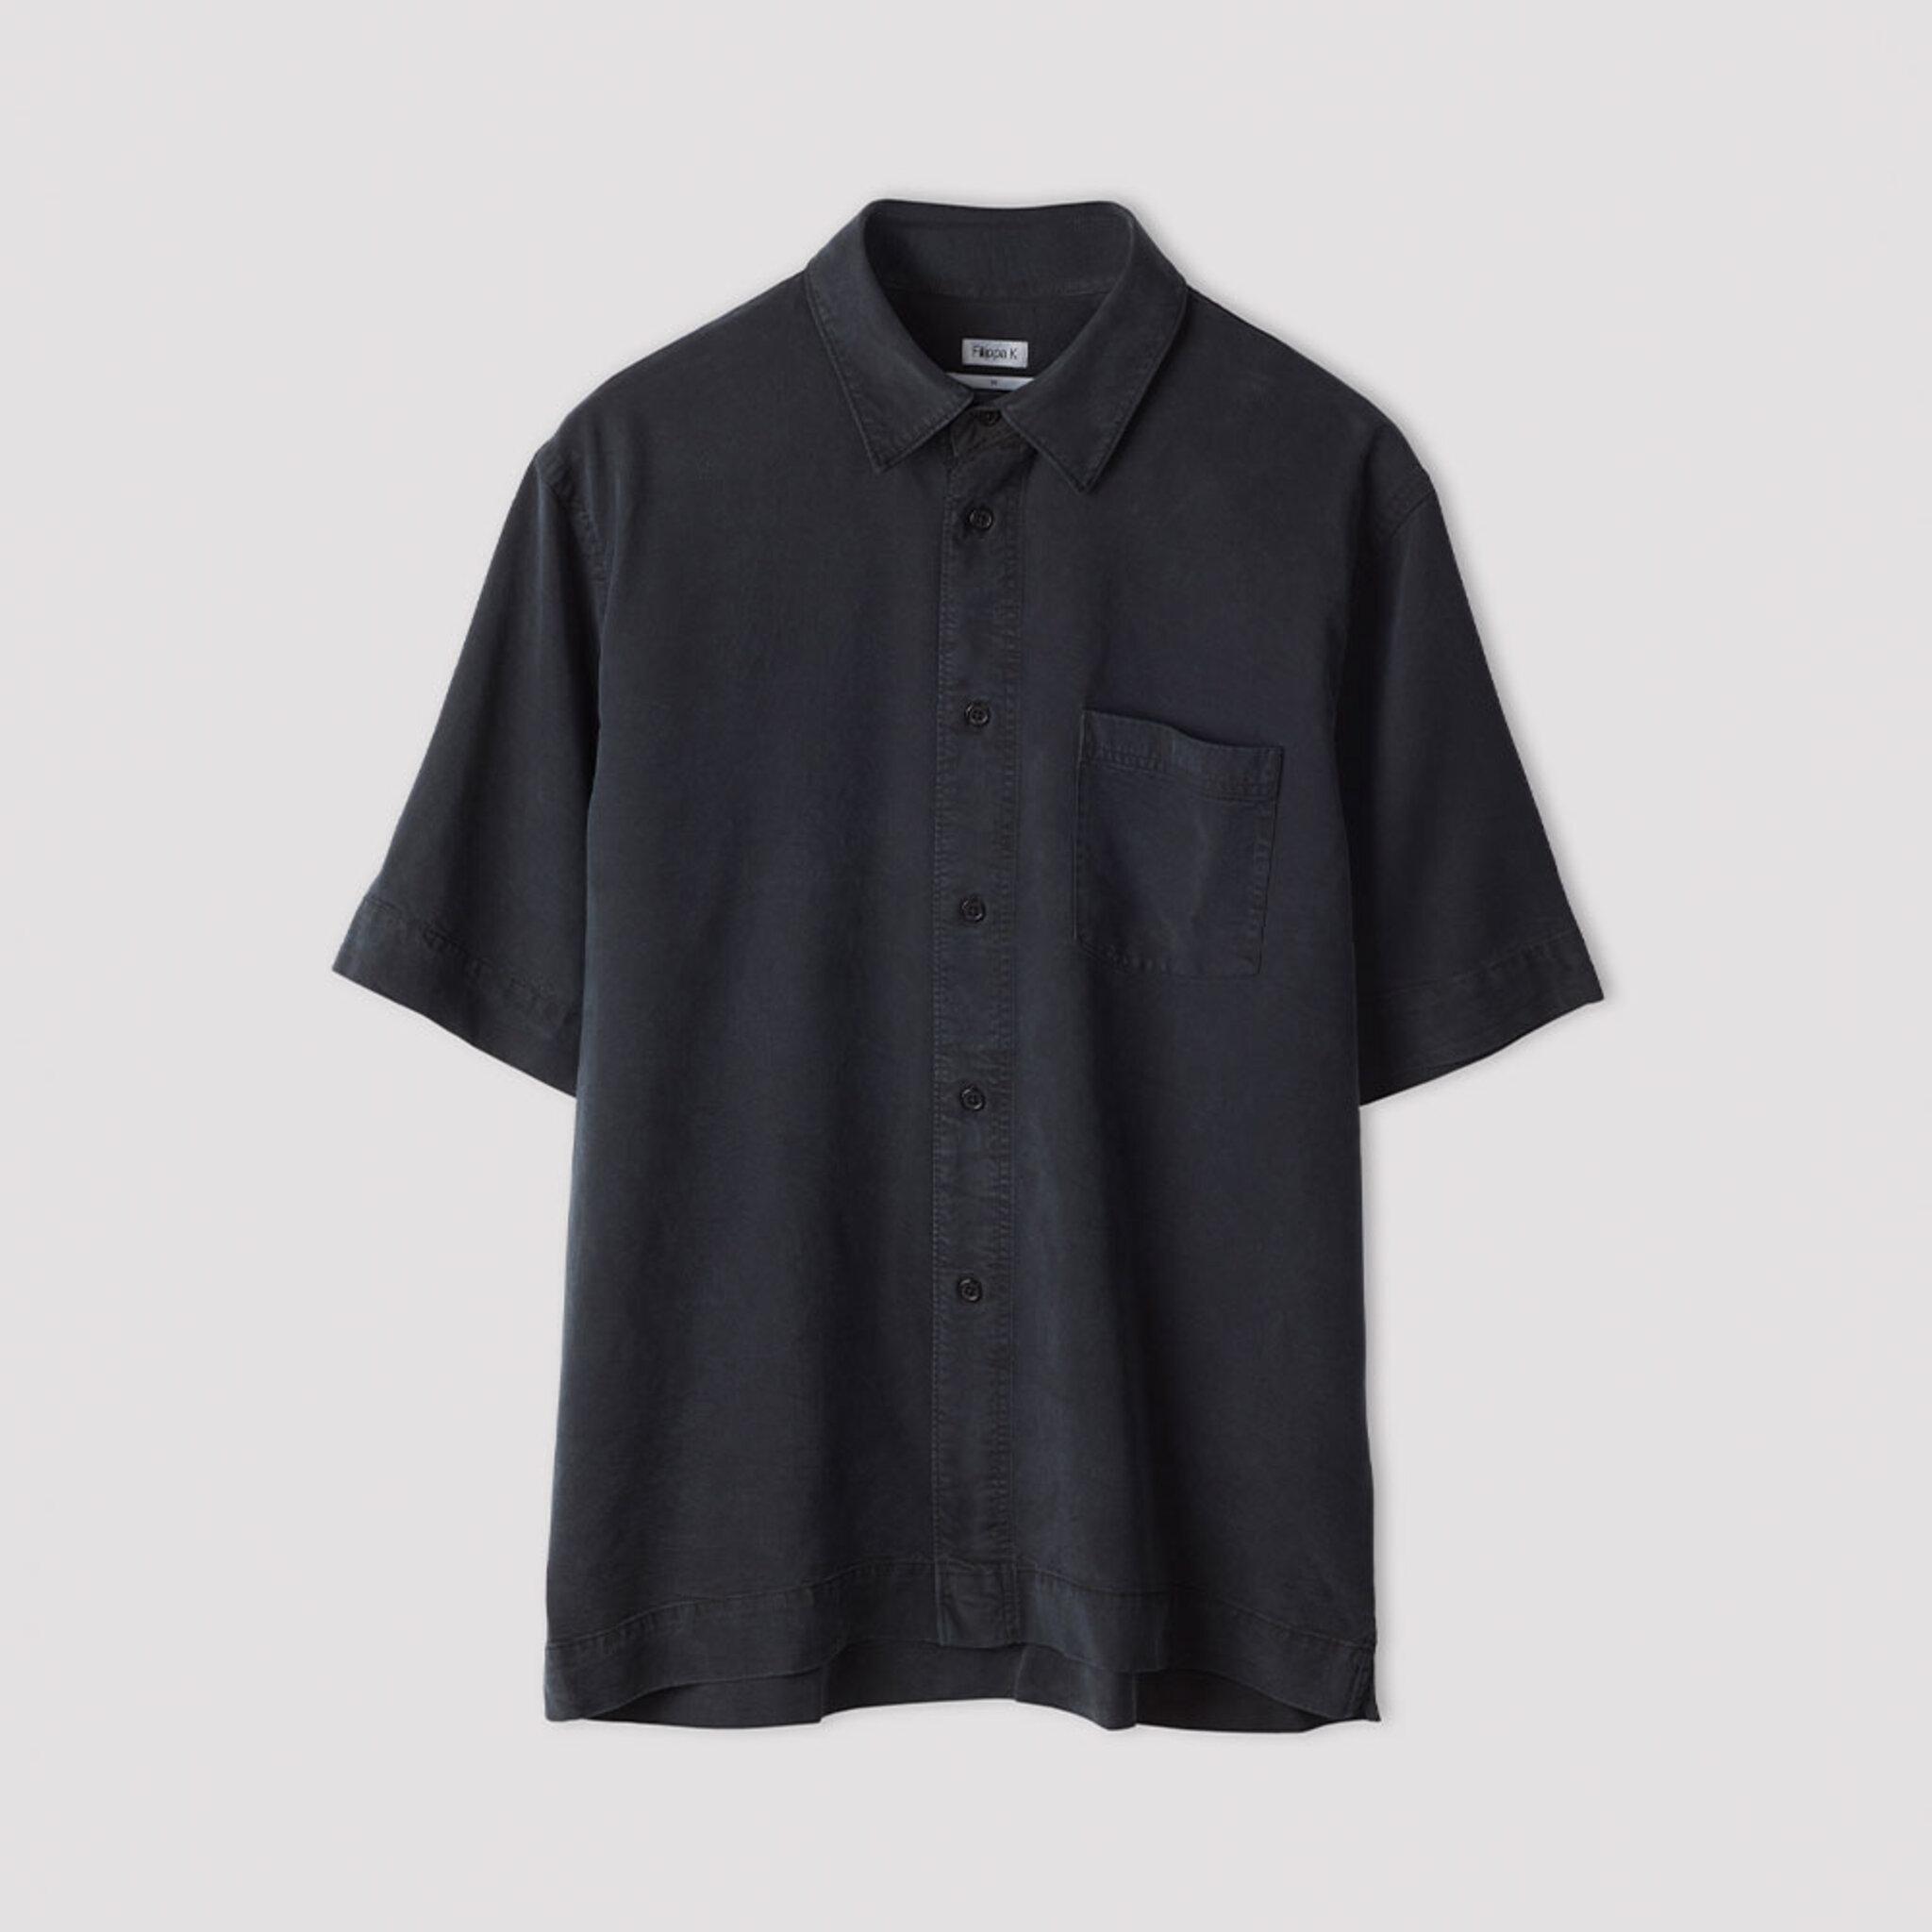 M. Owen Tencel Shirt